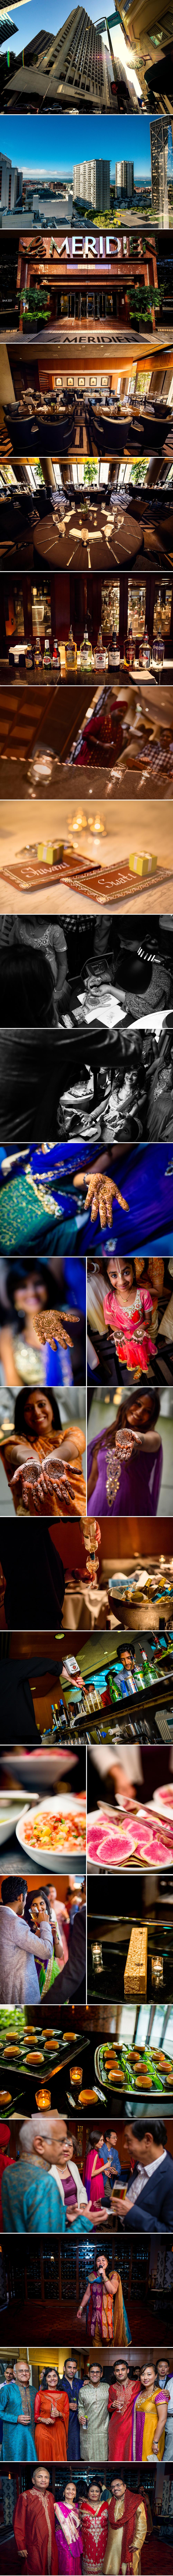 Indian Wedding Le Meridien San Francisco